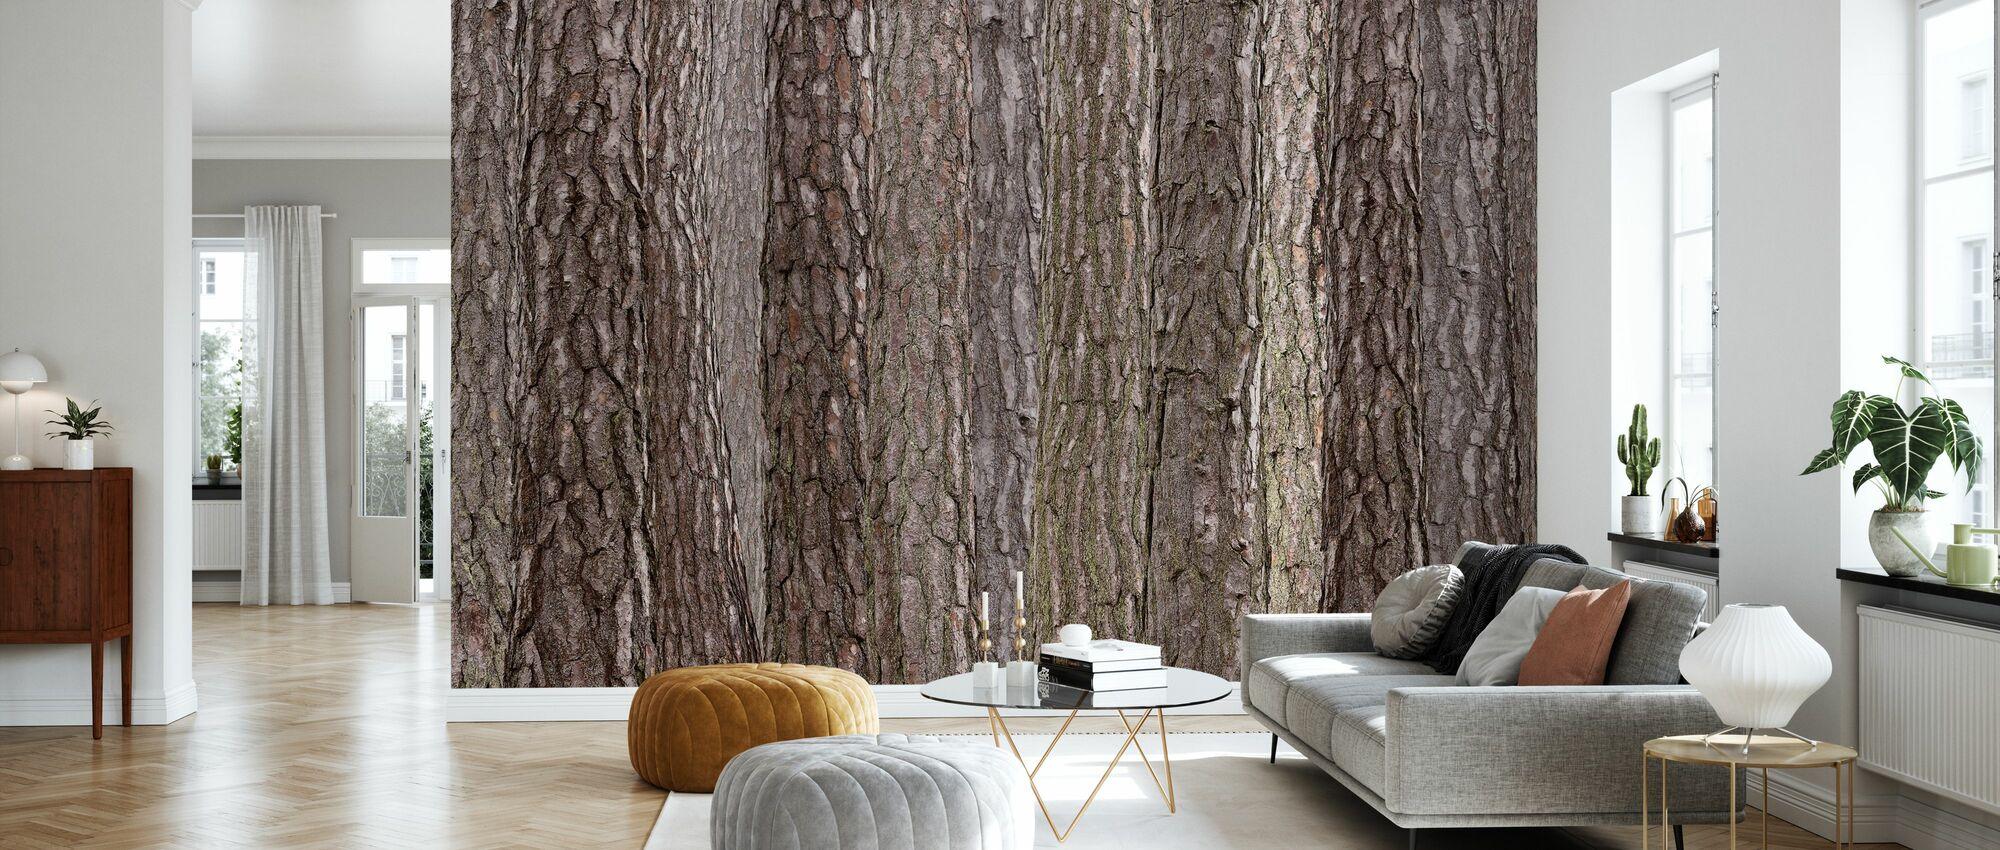 Park Brown - Wallpaper - Living Room